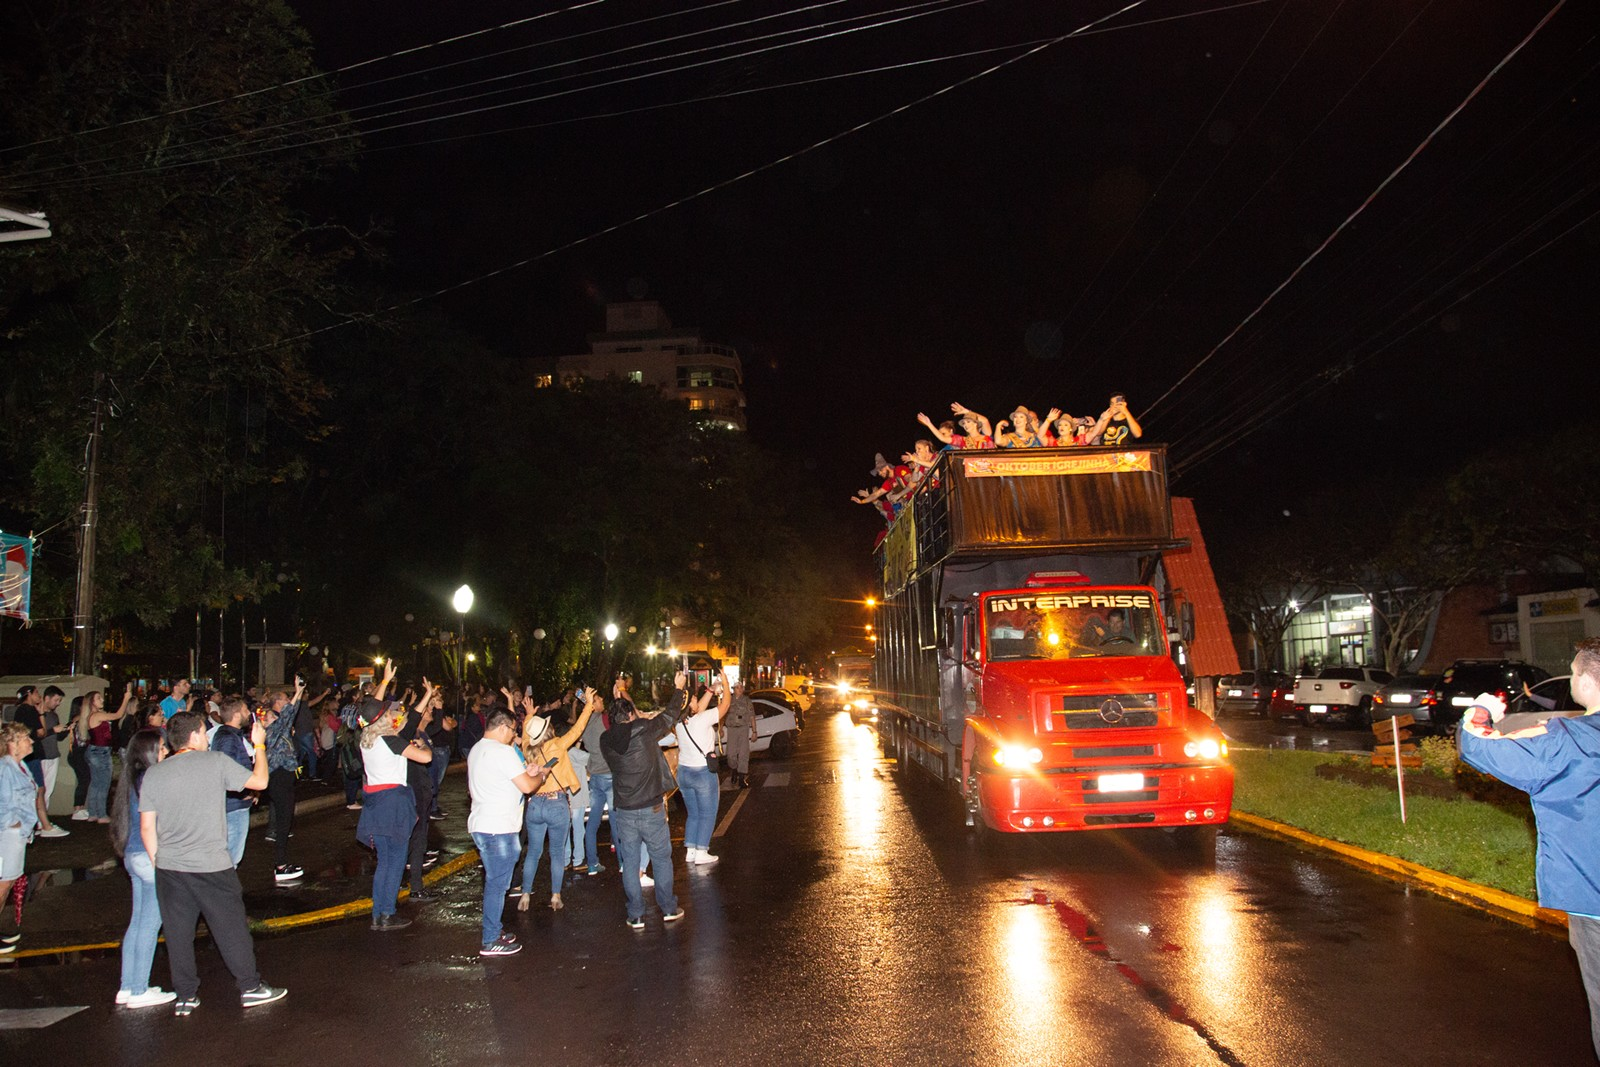 Carreata do Chopp 32ª Oktoberfest